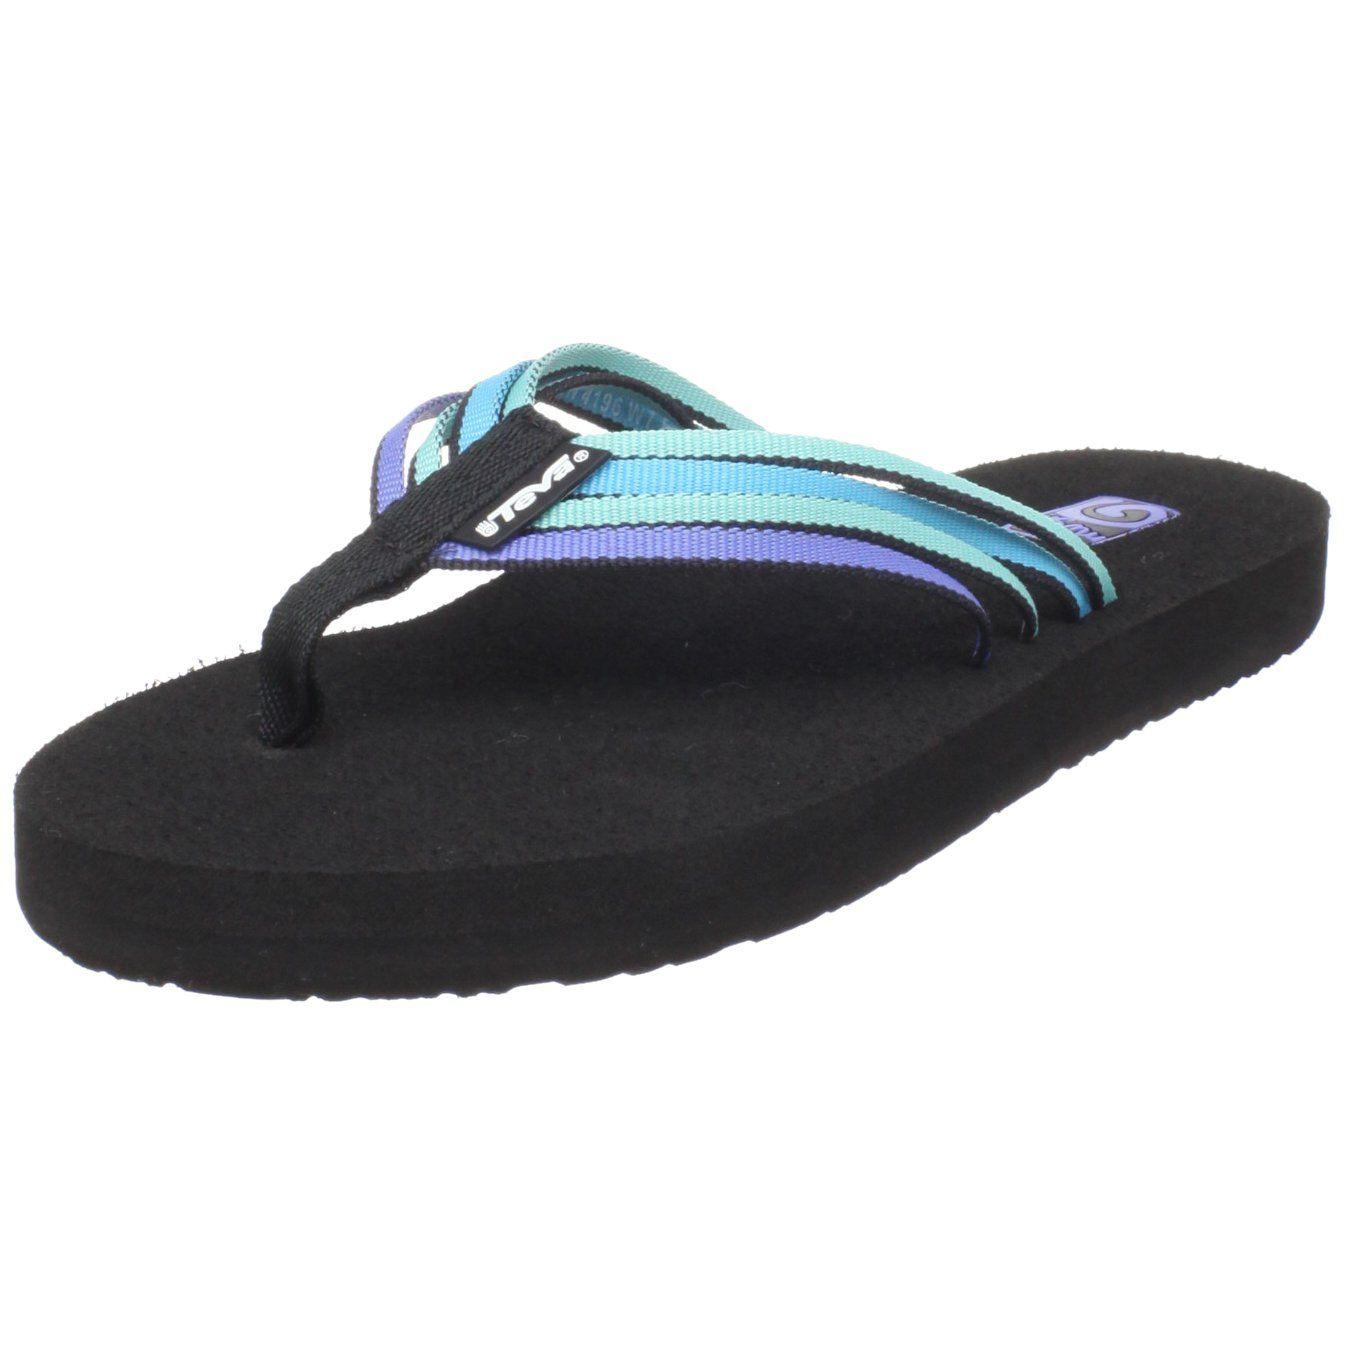 Zapatos azules Teva Mush infantiles zGk3i6